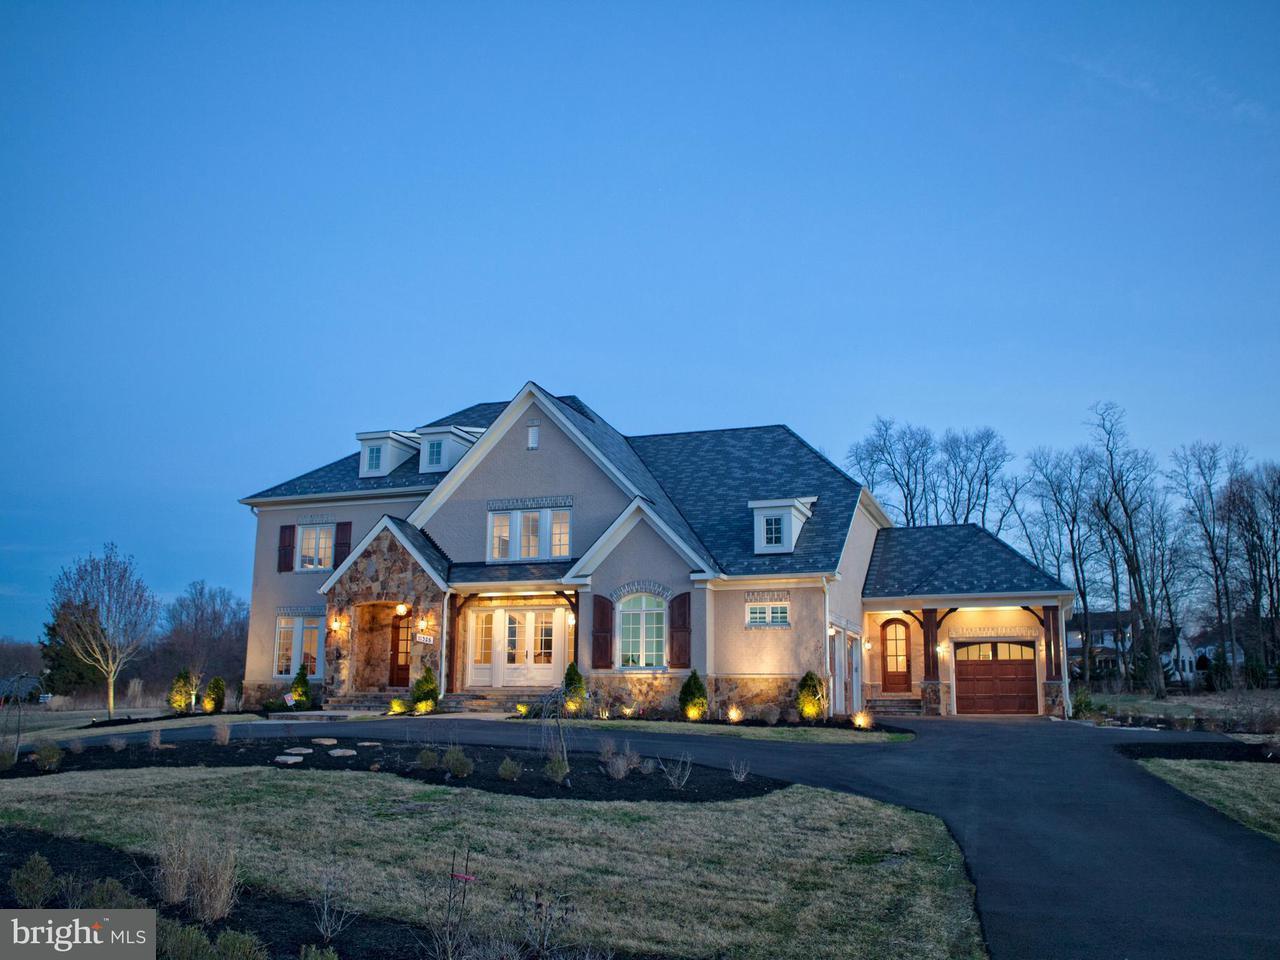 Single Family Home for Sale at 11325 Fox Creek Farm Way 11325 Fox Creek Farm Way Great Falls, Virginia 22066 United States